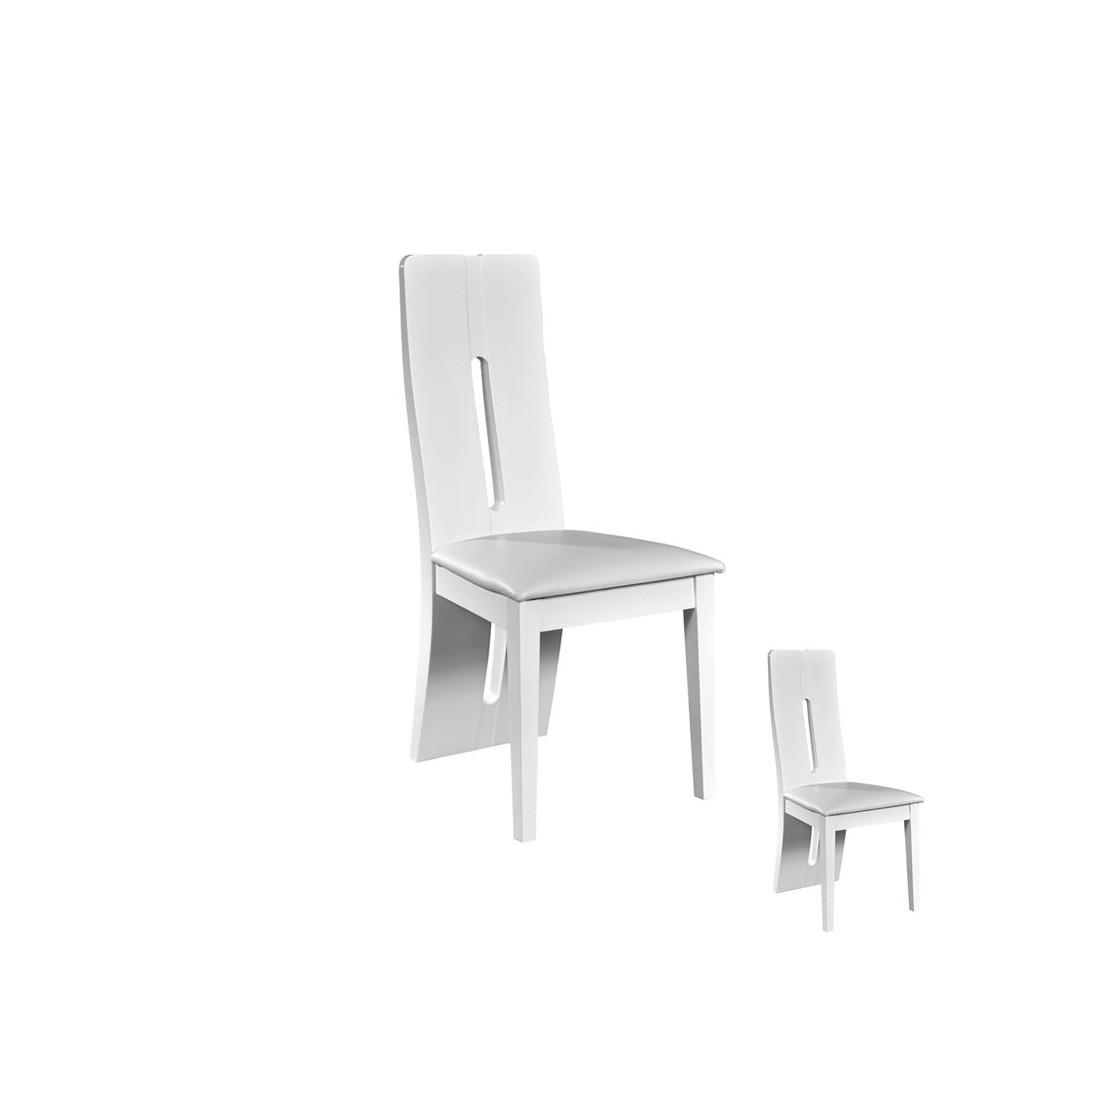 Duo de chaises simili cuir blanc fily univers assises - Chaises simili cuir blanc ...